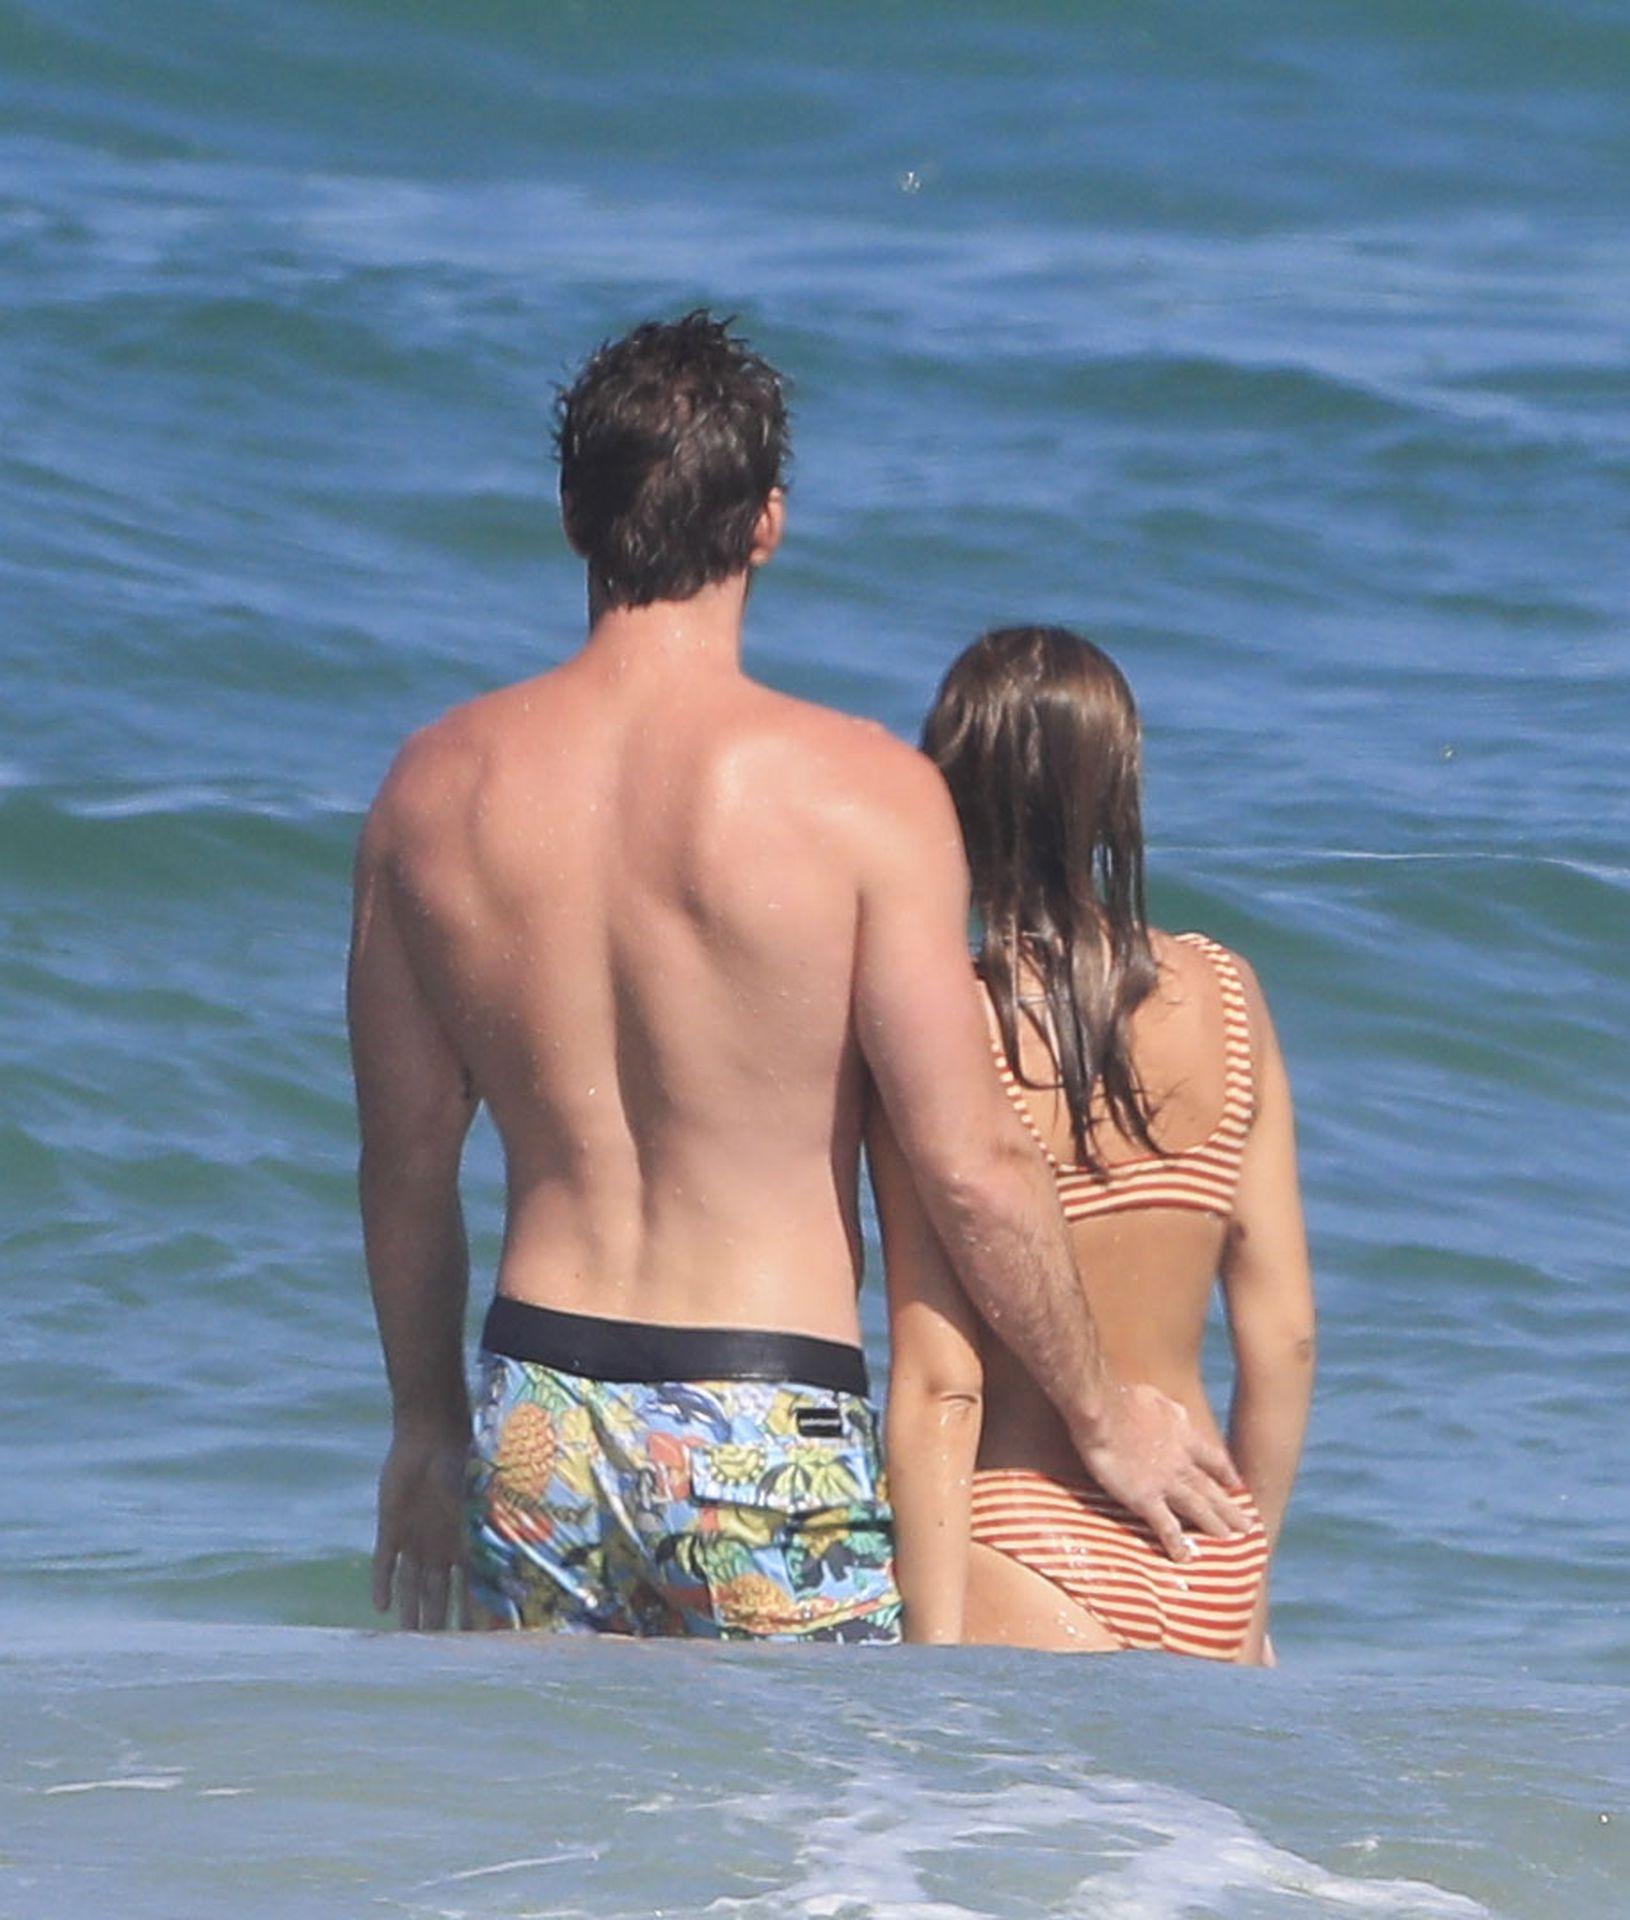 Gabriella Brooks Hot – Liam Hemsworth's New Girlfriend 0035